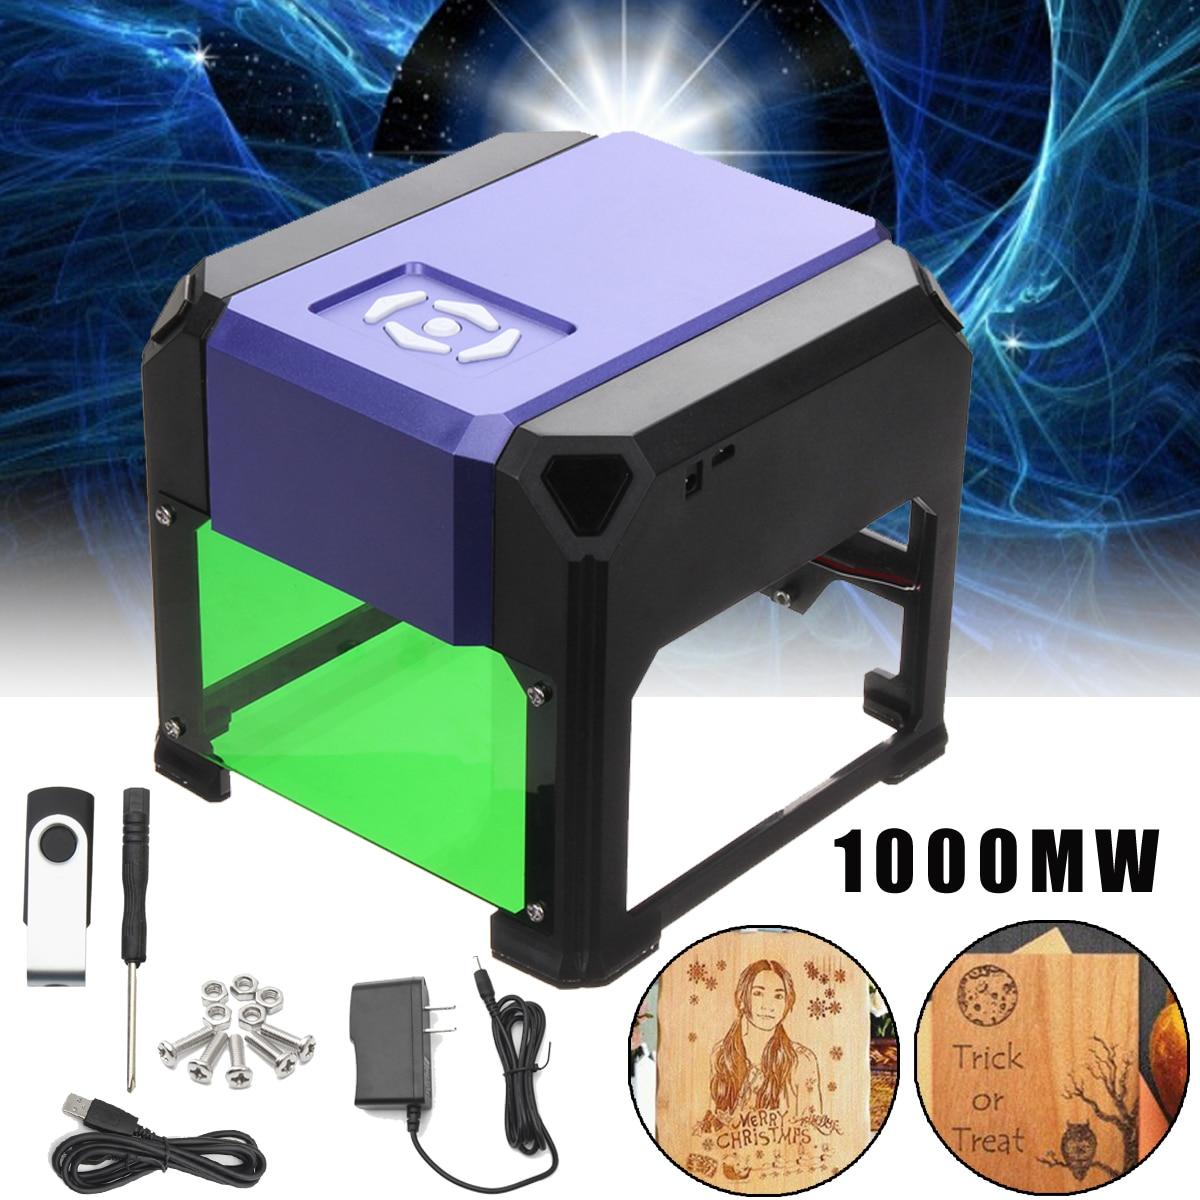 1000mW Laser Engraver DIY Engraving Machine Cutter DIY Logo Mark Printer CNC Laser Cutter Carving 80x80mm For WIN/7/8/10 for XP цена 2017